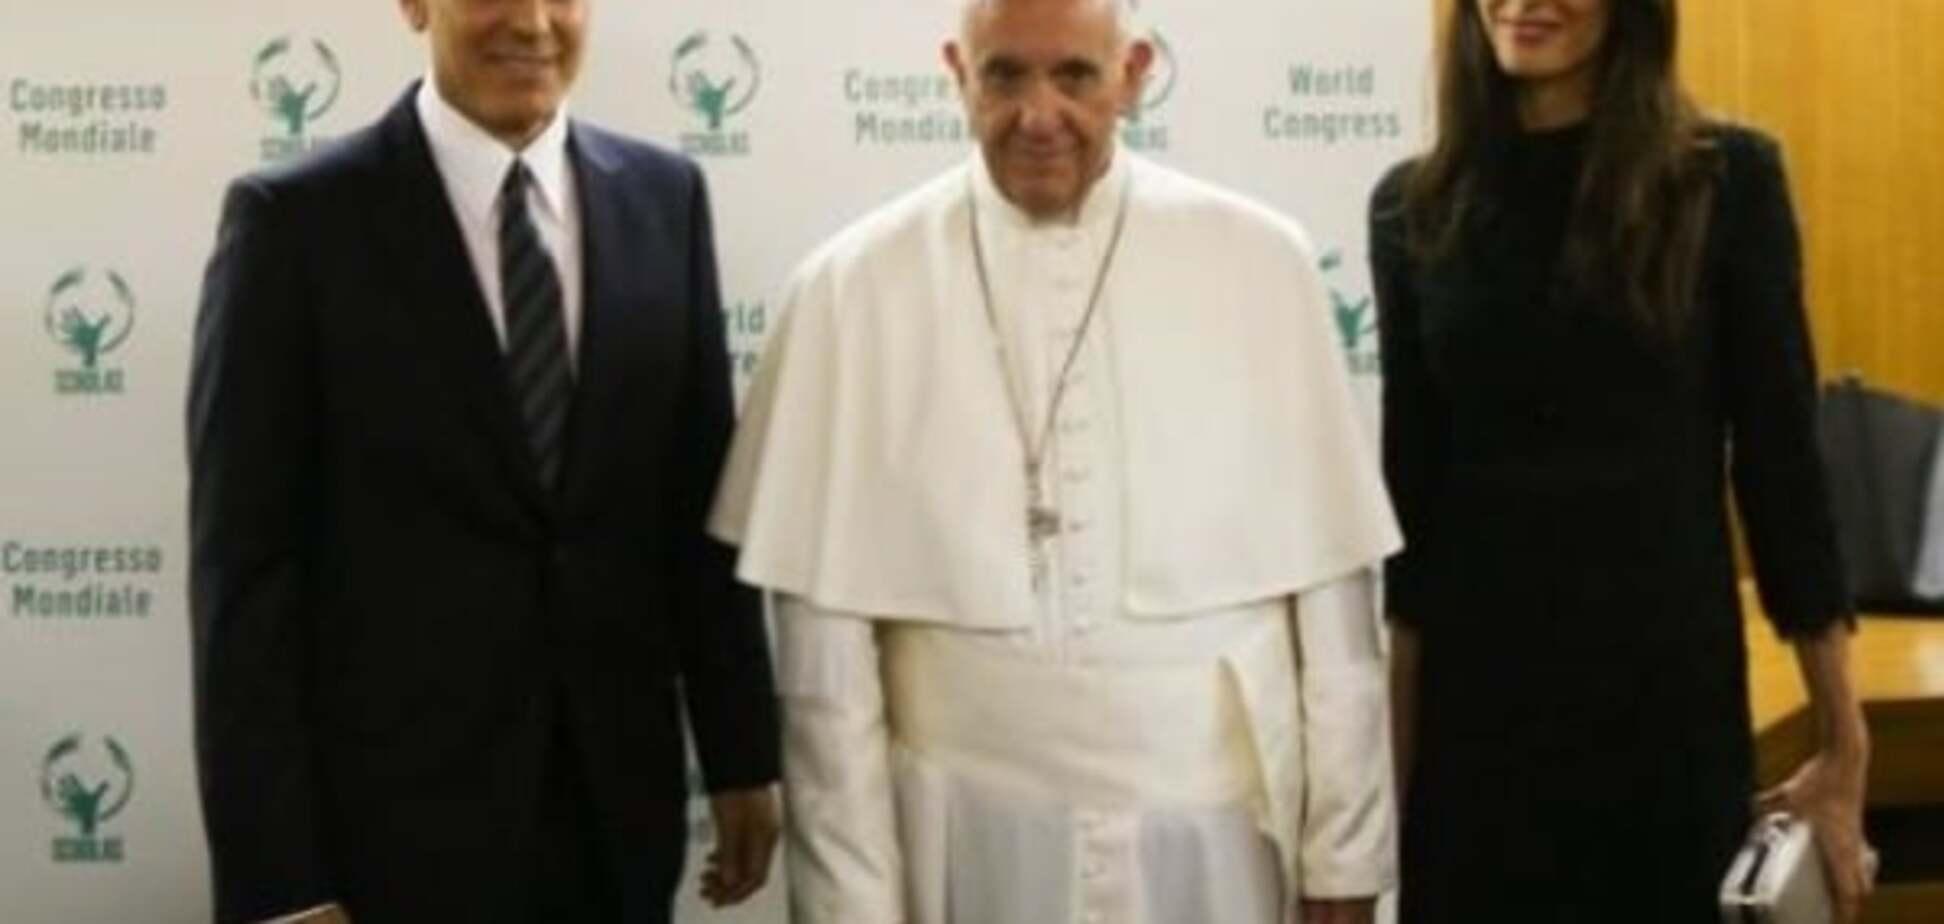 Джордж Клуни, Папа римский Франциск, Сальма Хайек